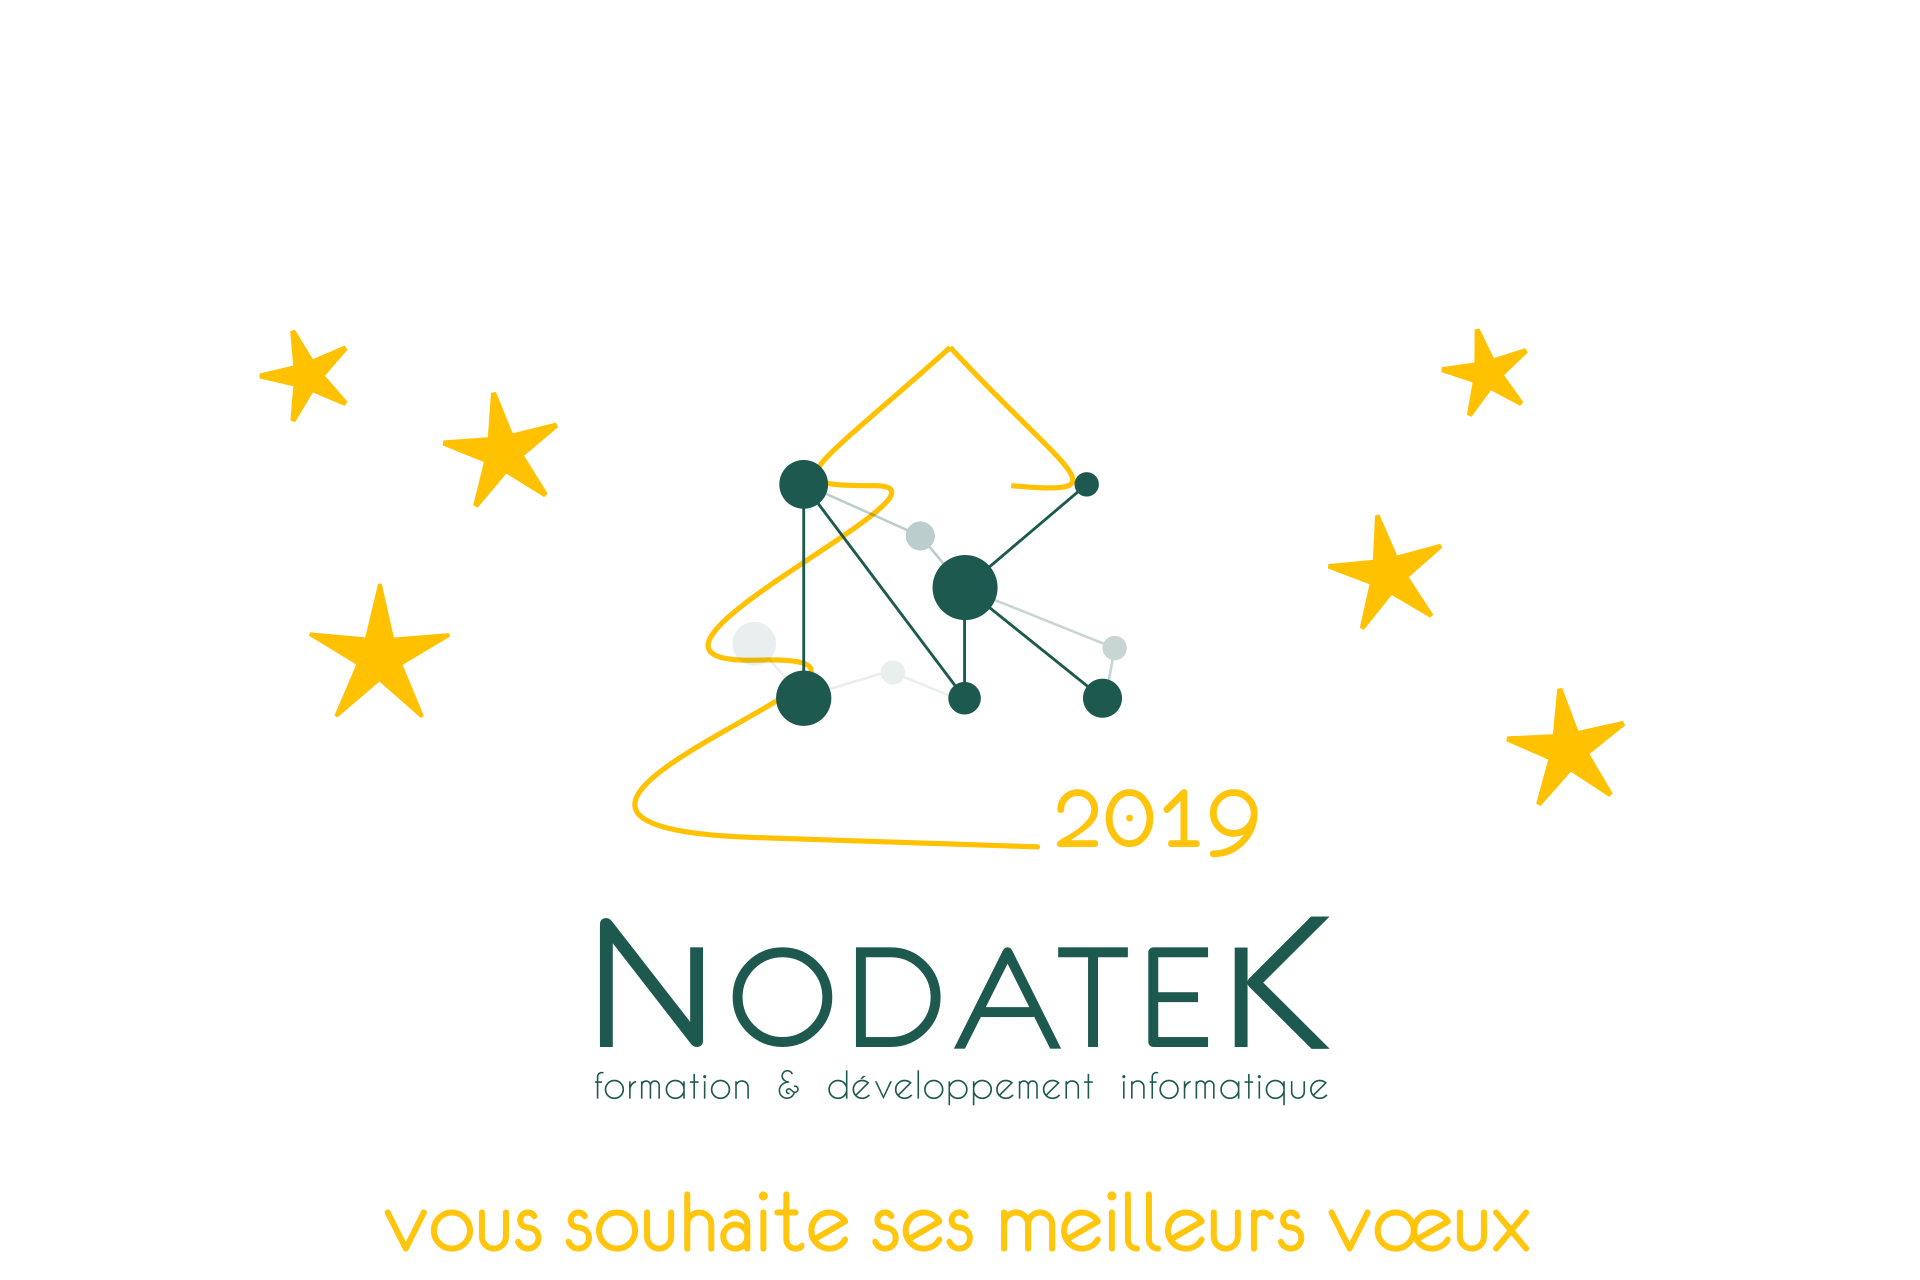 Carte vœux Nodatek 2019